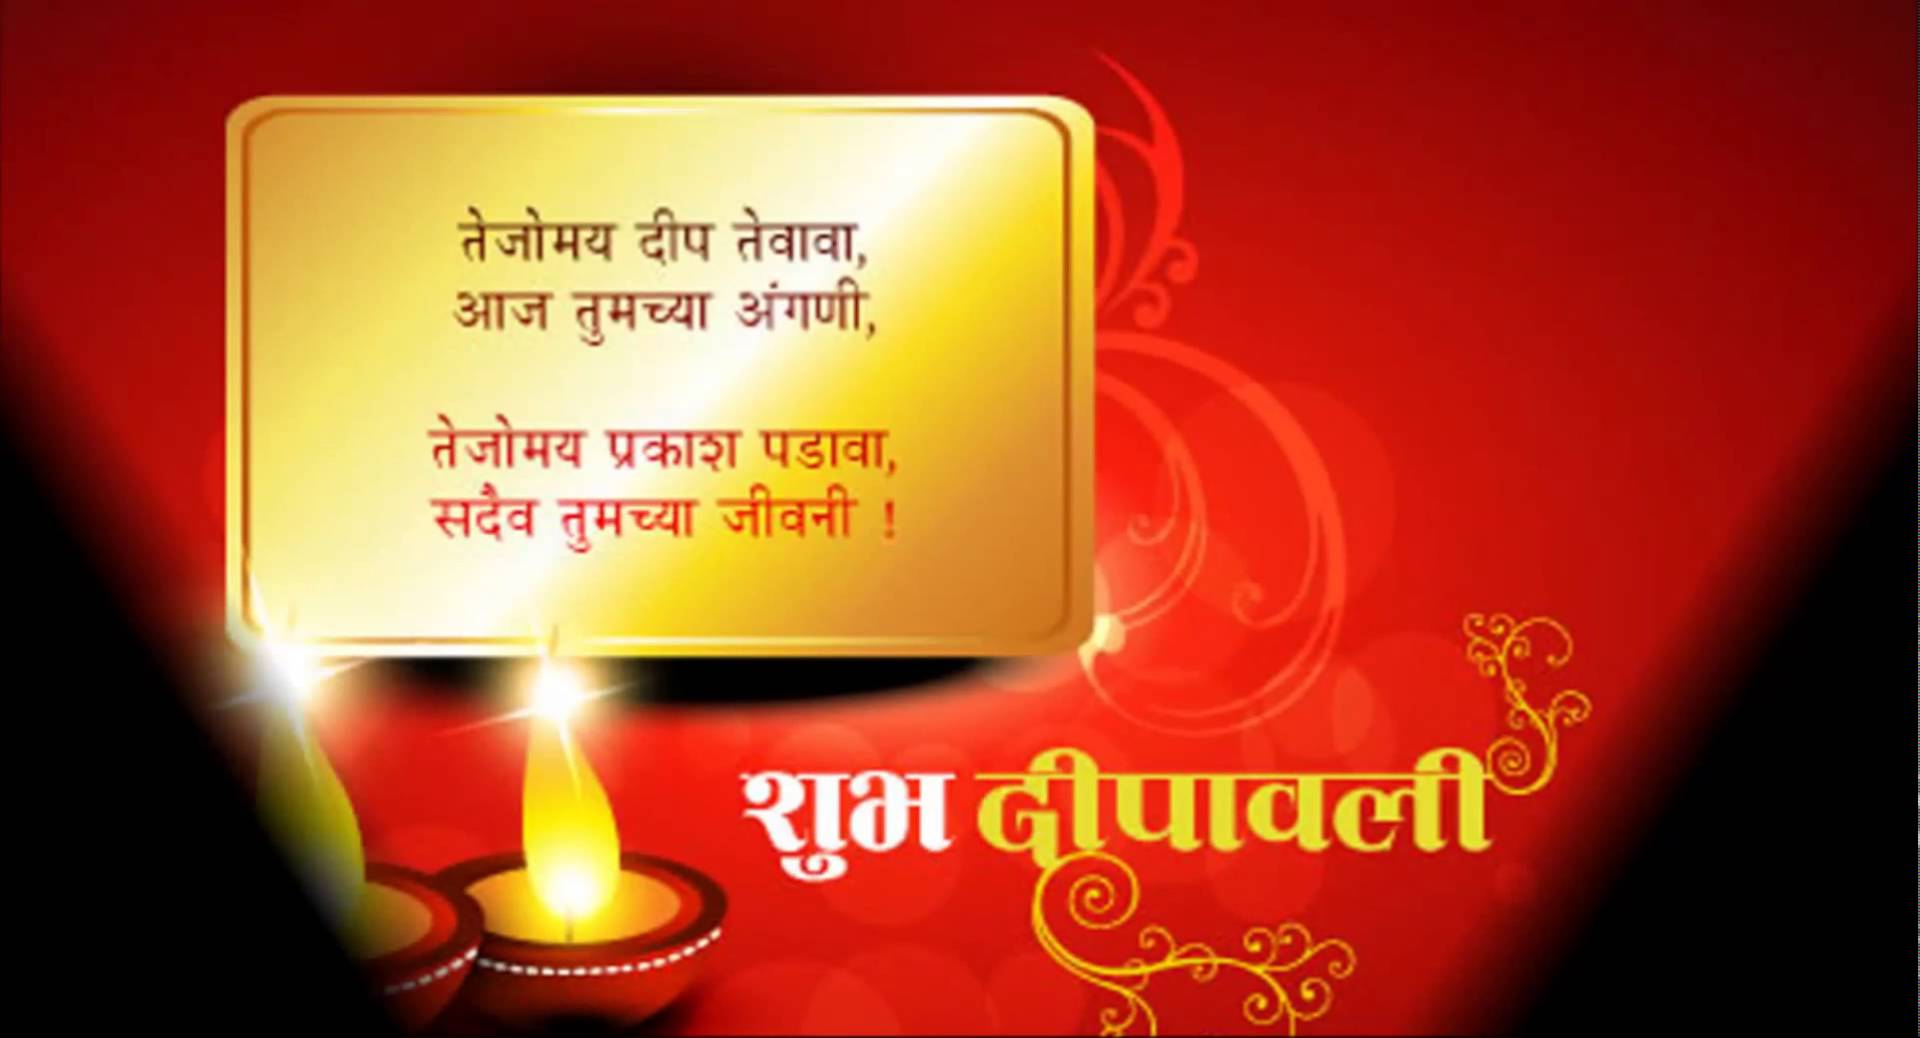 Happy Diwali Marathi Greetings